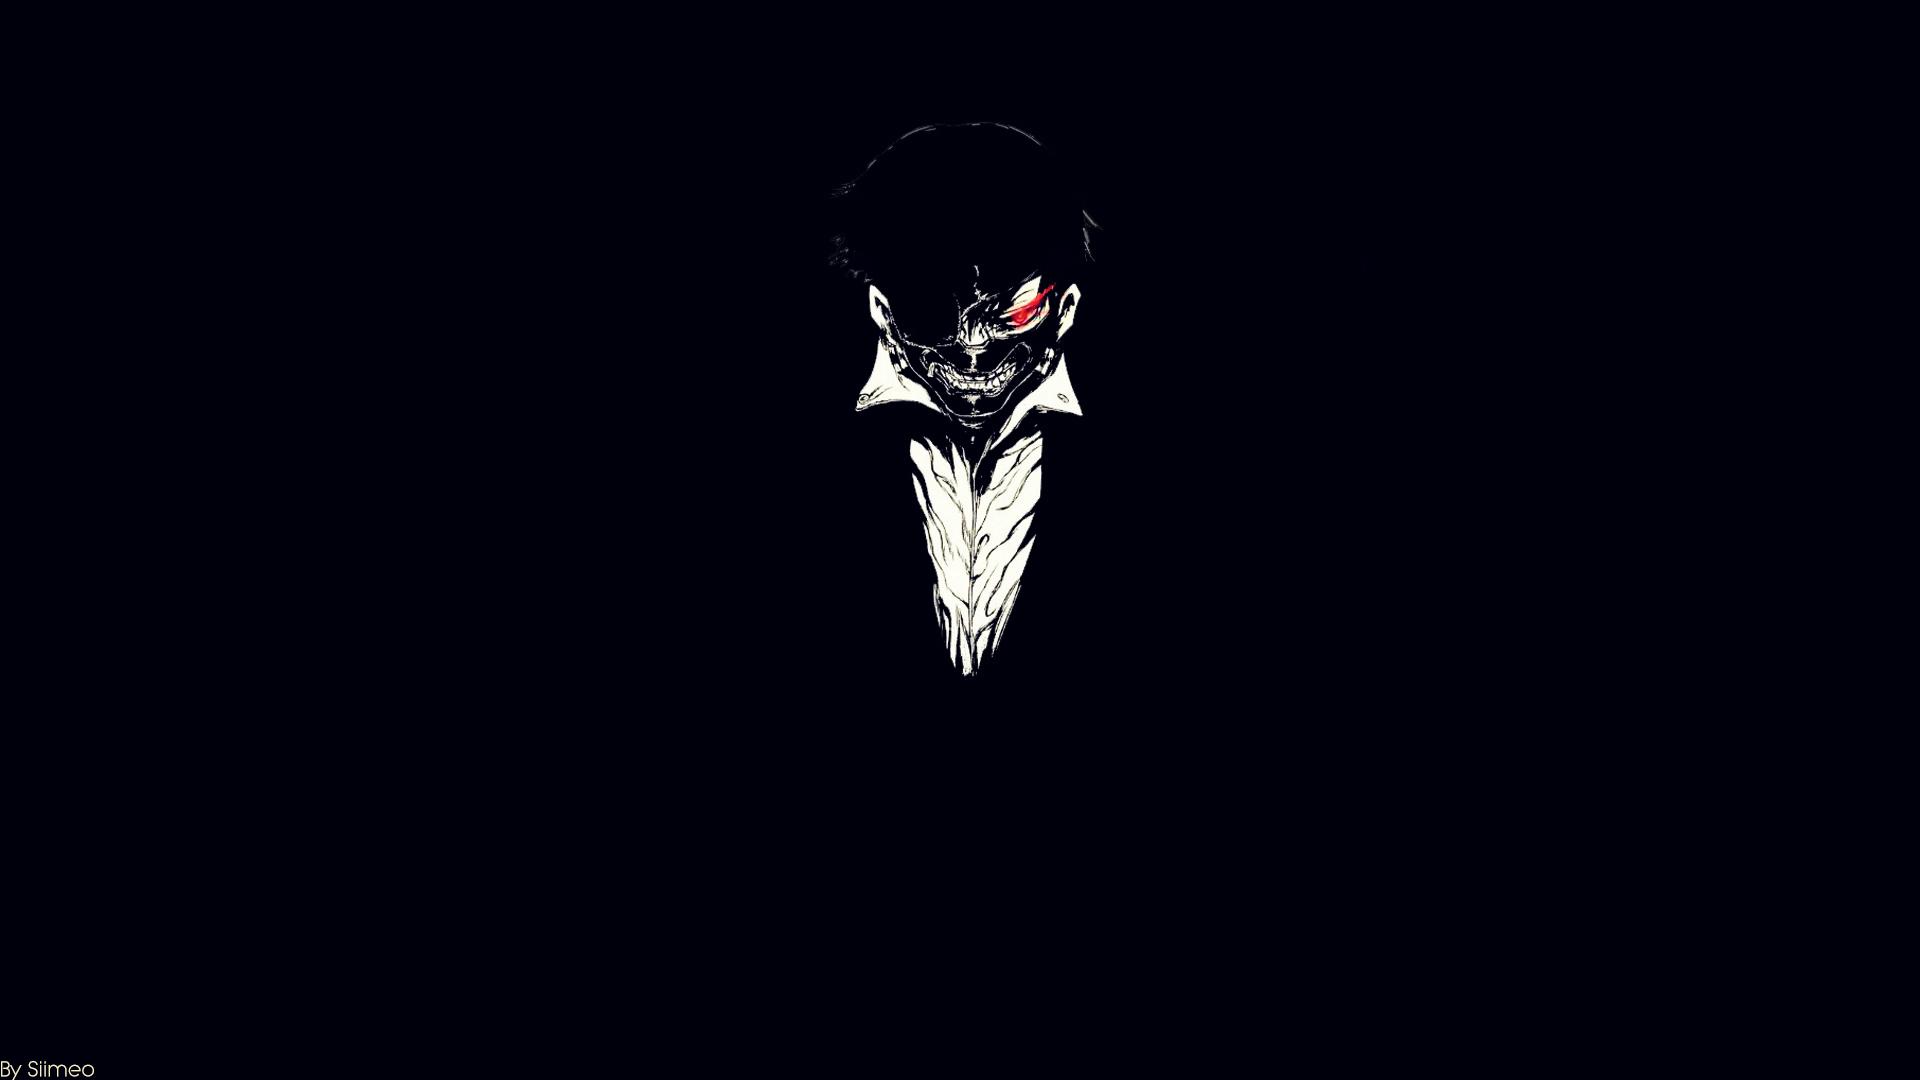 Ken Tokyo Ghoul anime mask red eye hd 1920x1080 1080p wallpaper 1920x1080